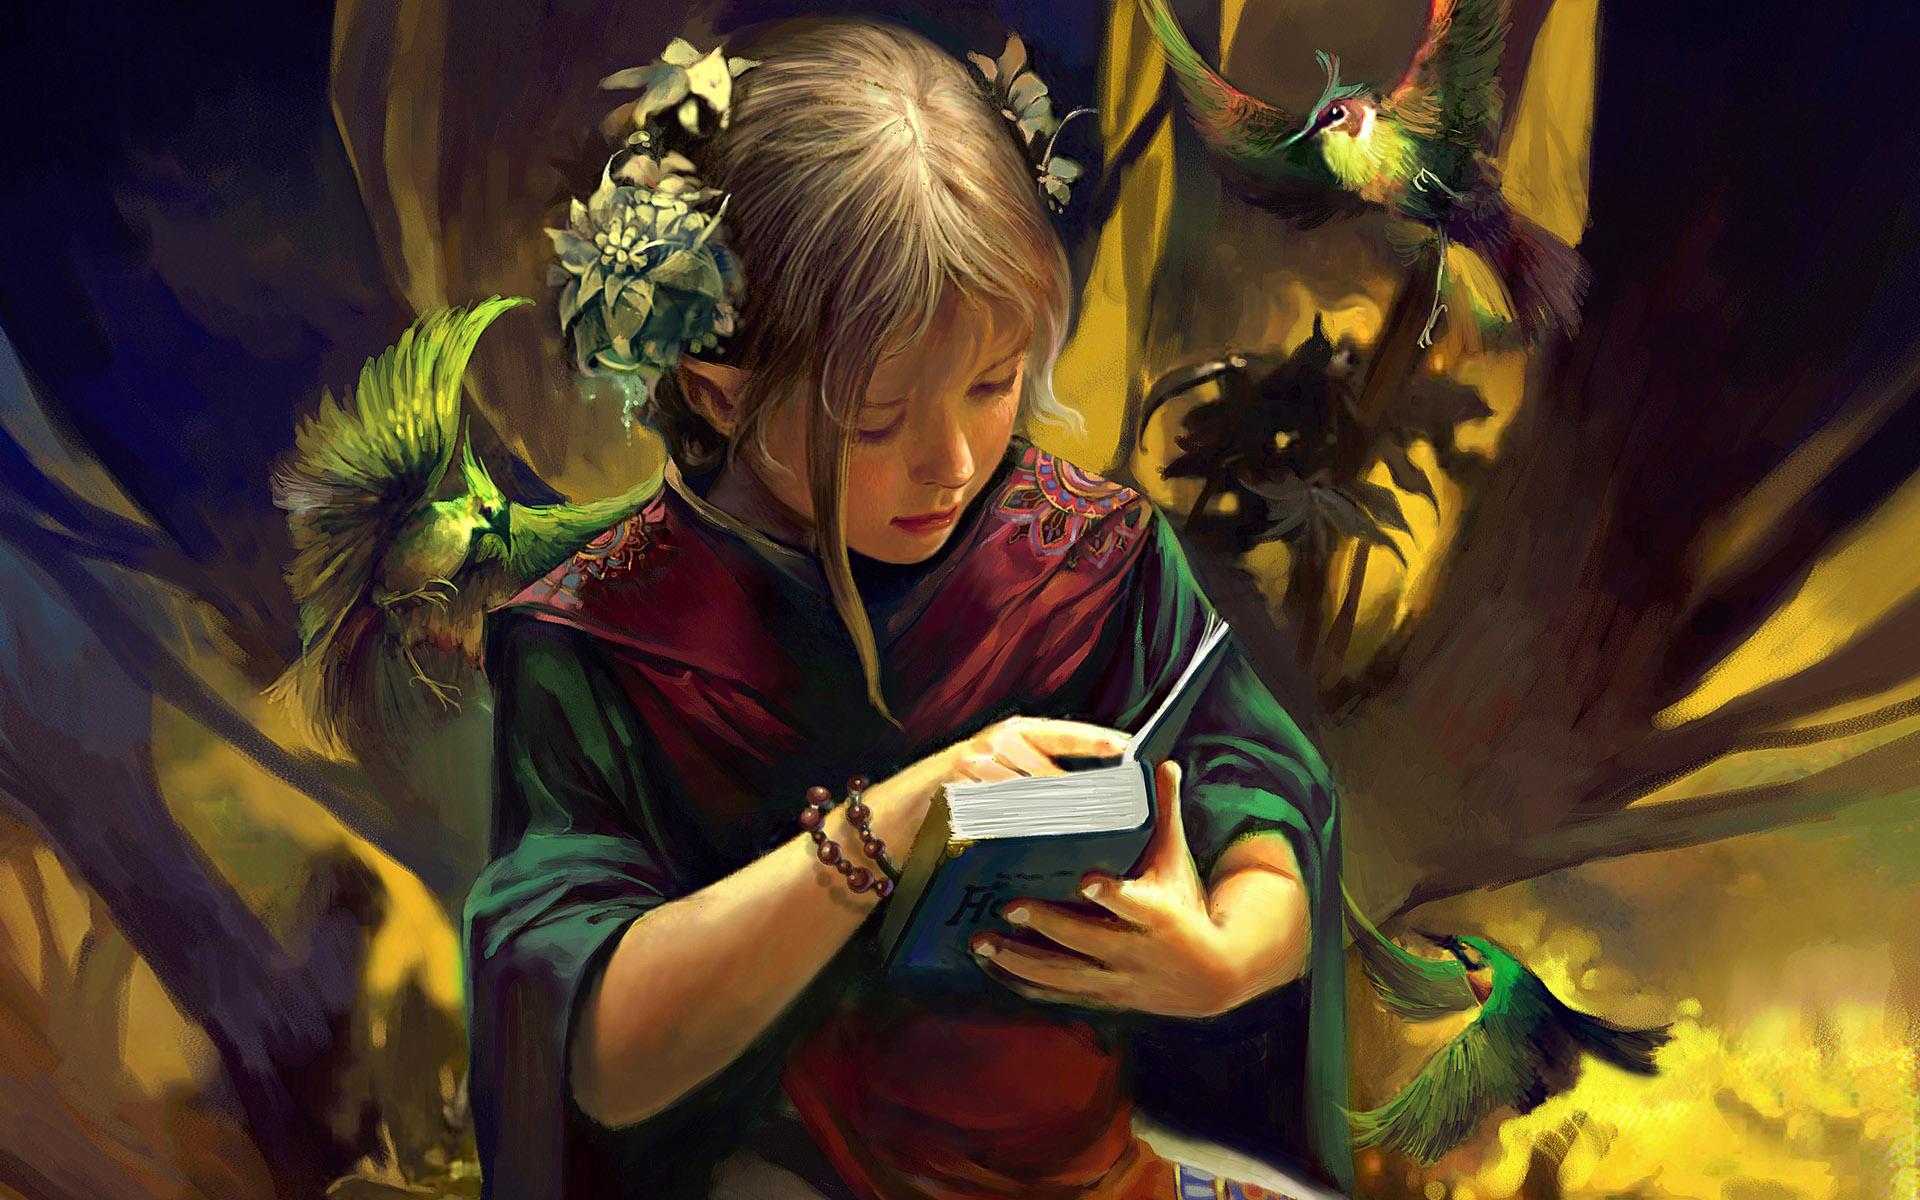 маршалкина фантастика детям картинки собой, там масса